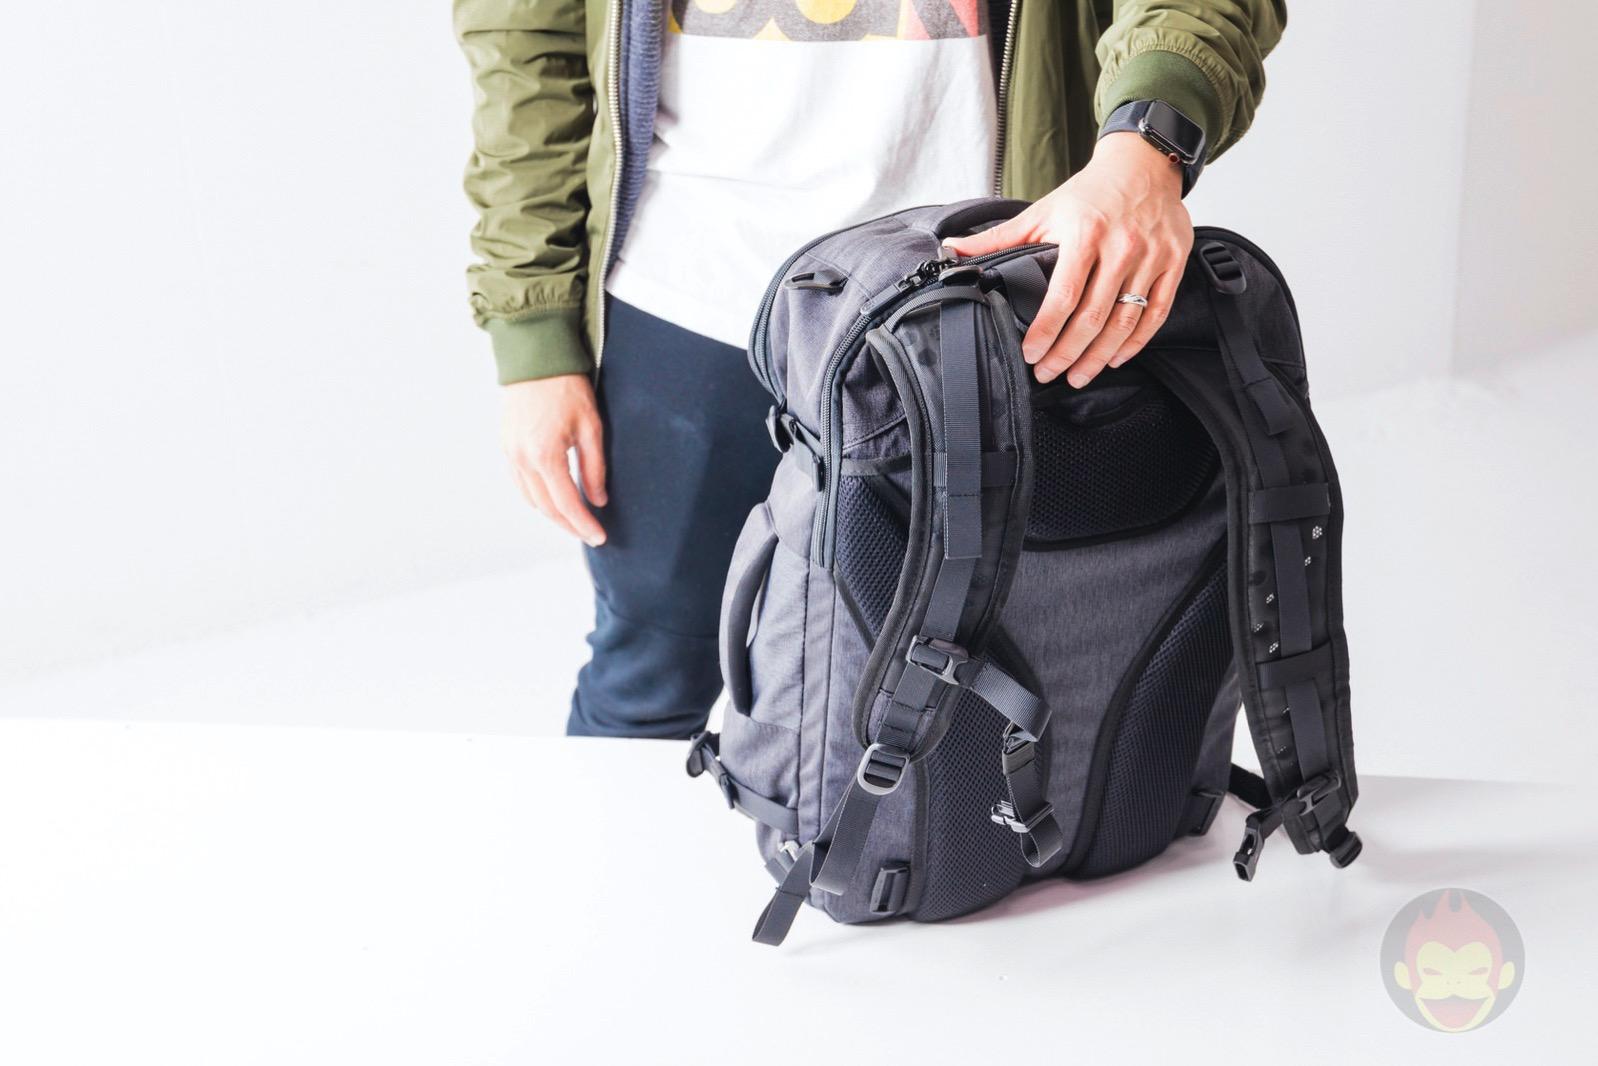 Tortuga-Setout-Backpack-35liter-review-10.jpg